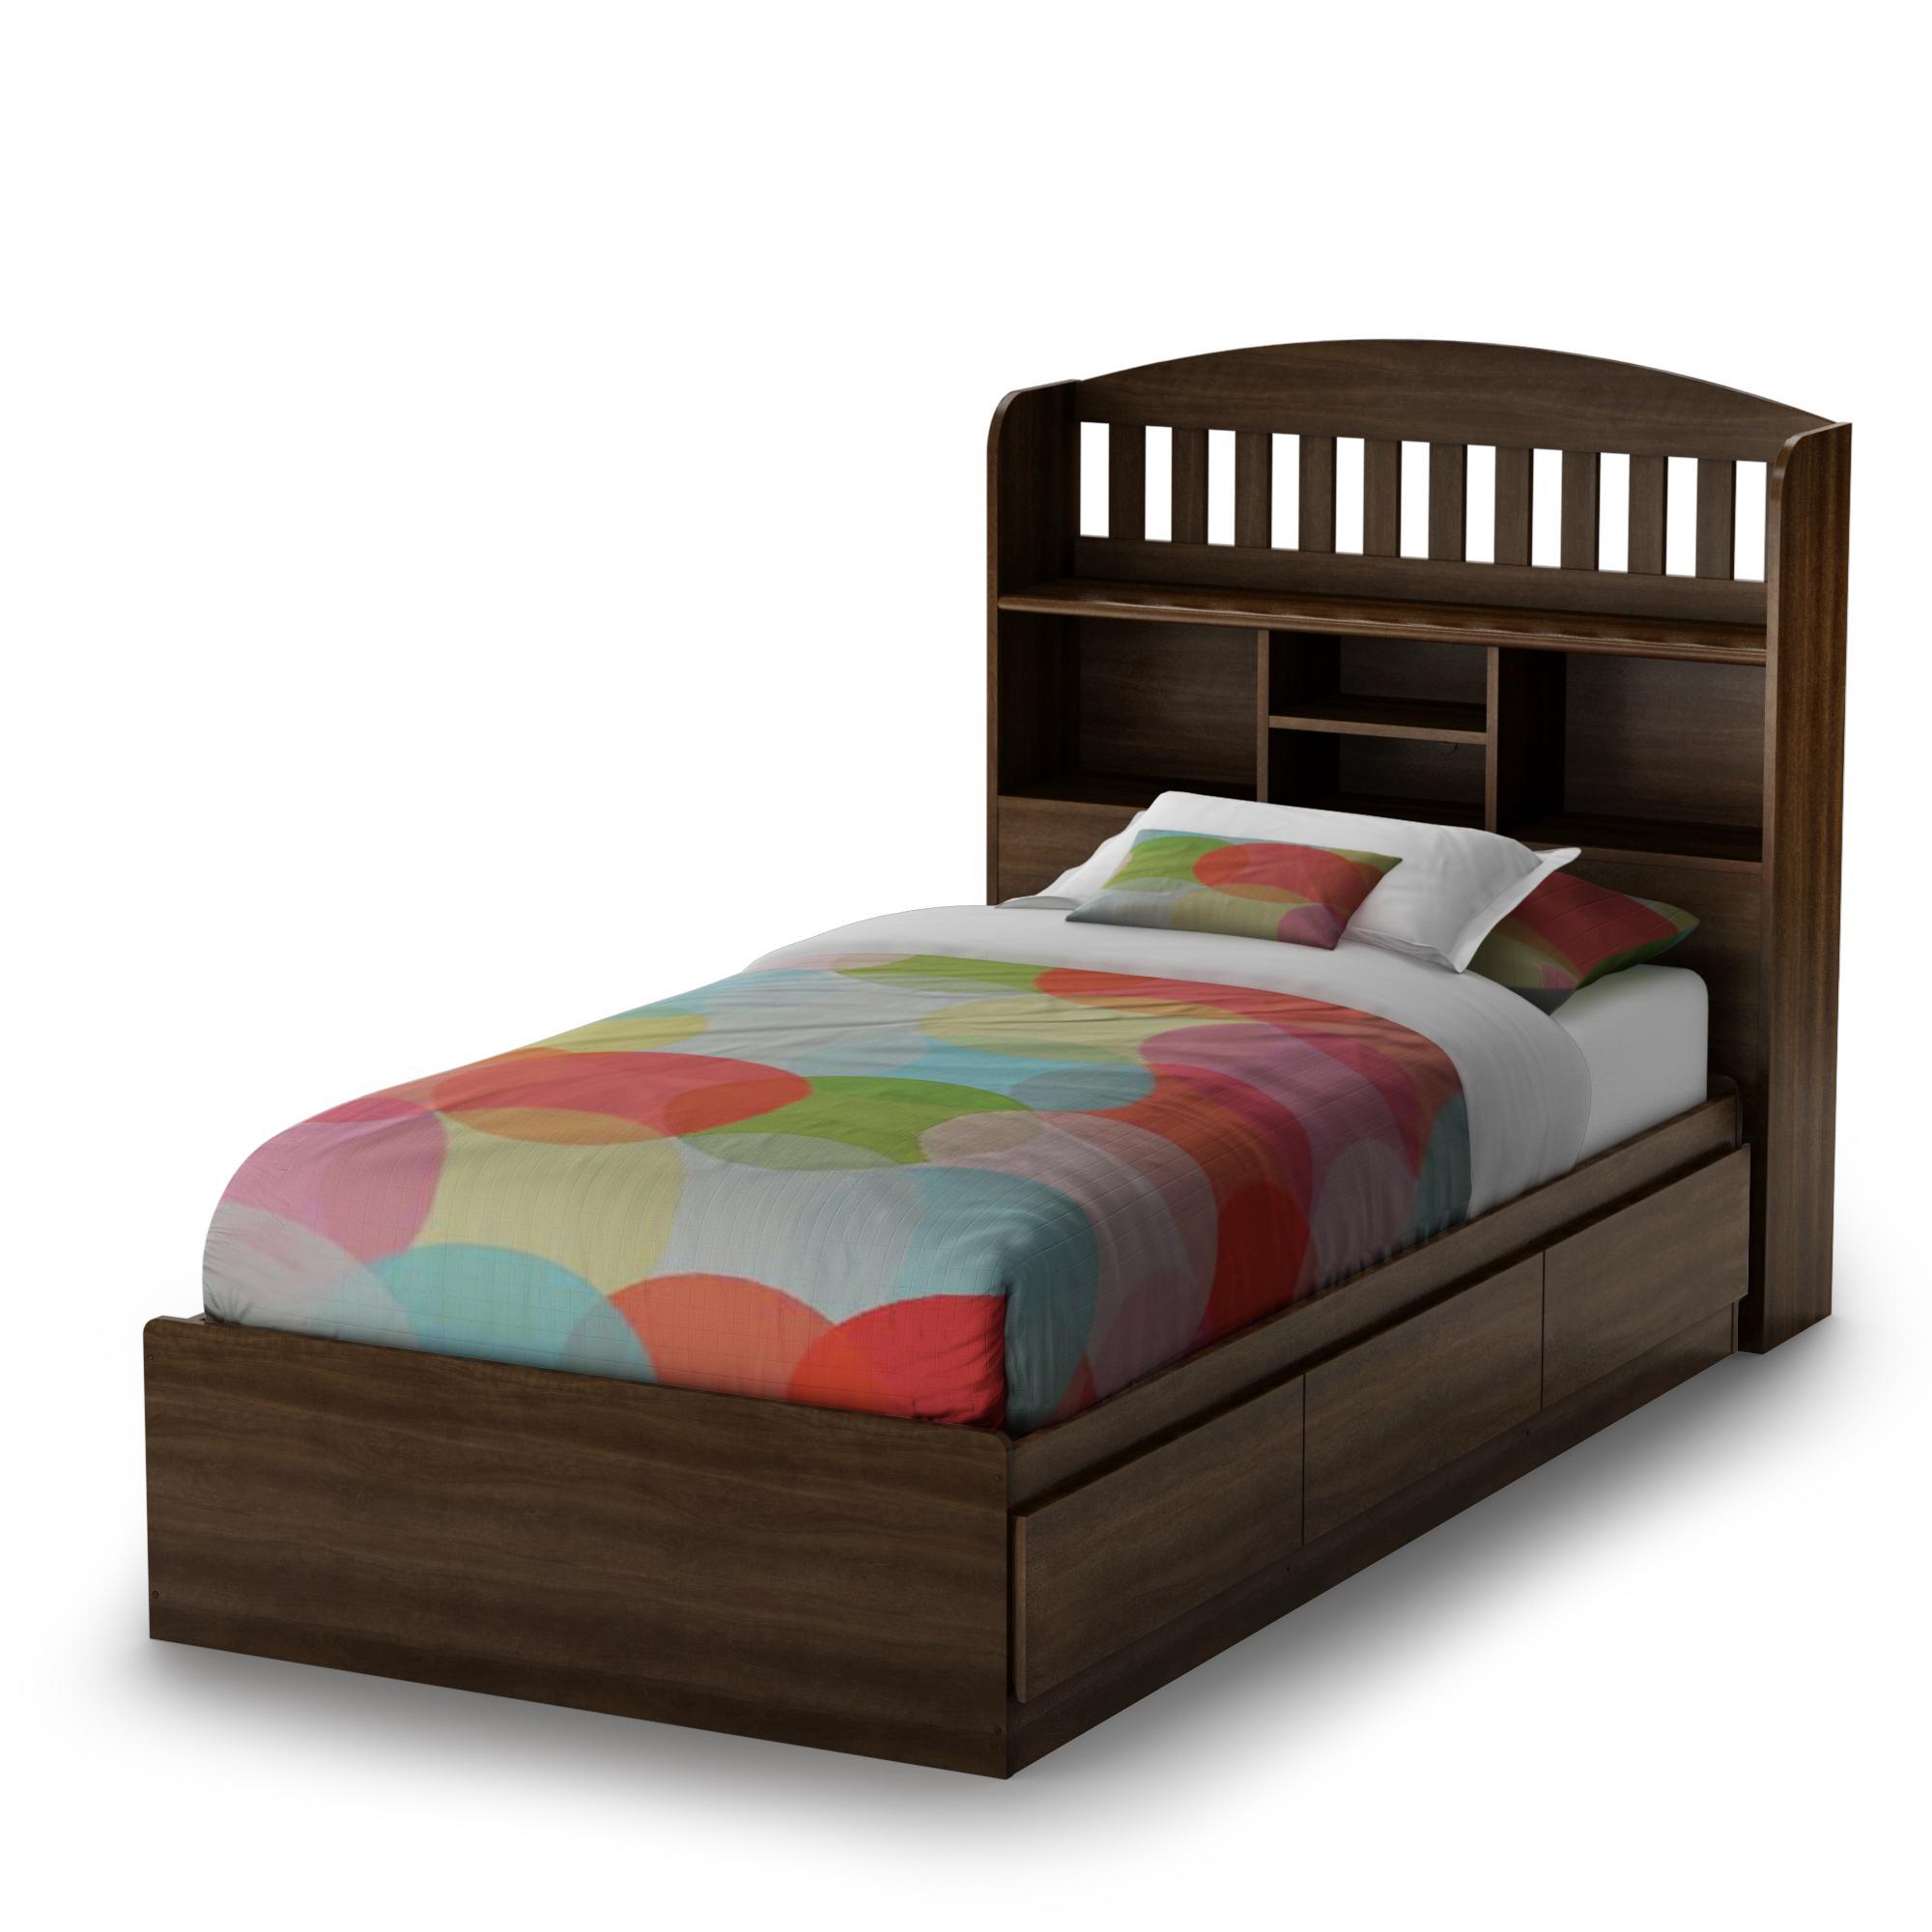 ikea twin bedroom furniture photo - 4